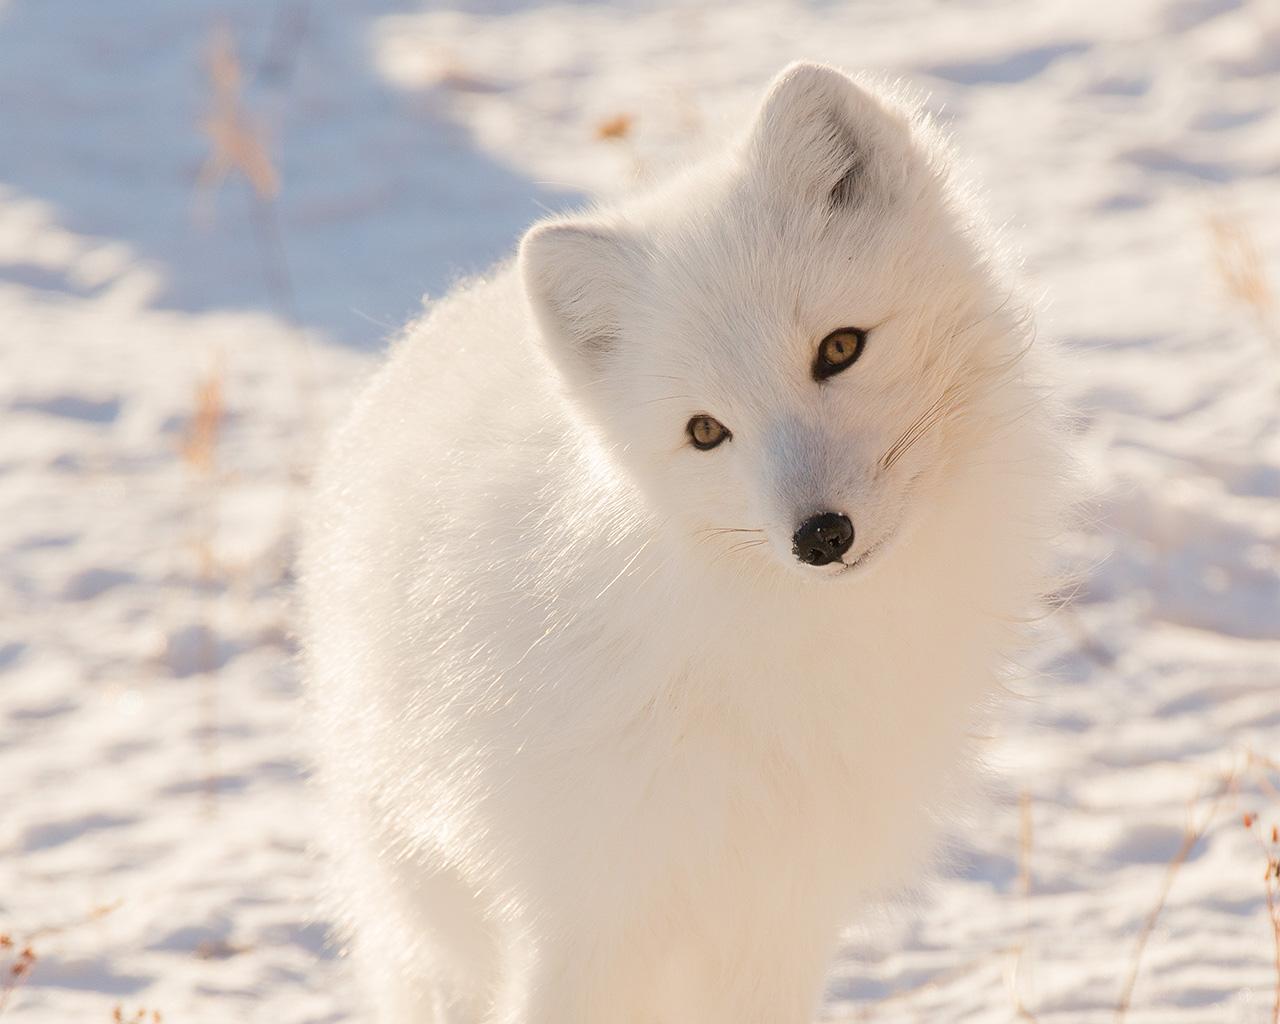 Fox Animal Wallpaper Mz77 Winter Animal Fox White Wallpaper